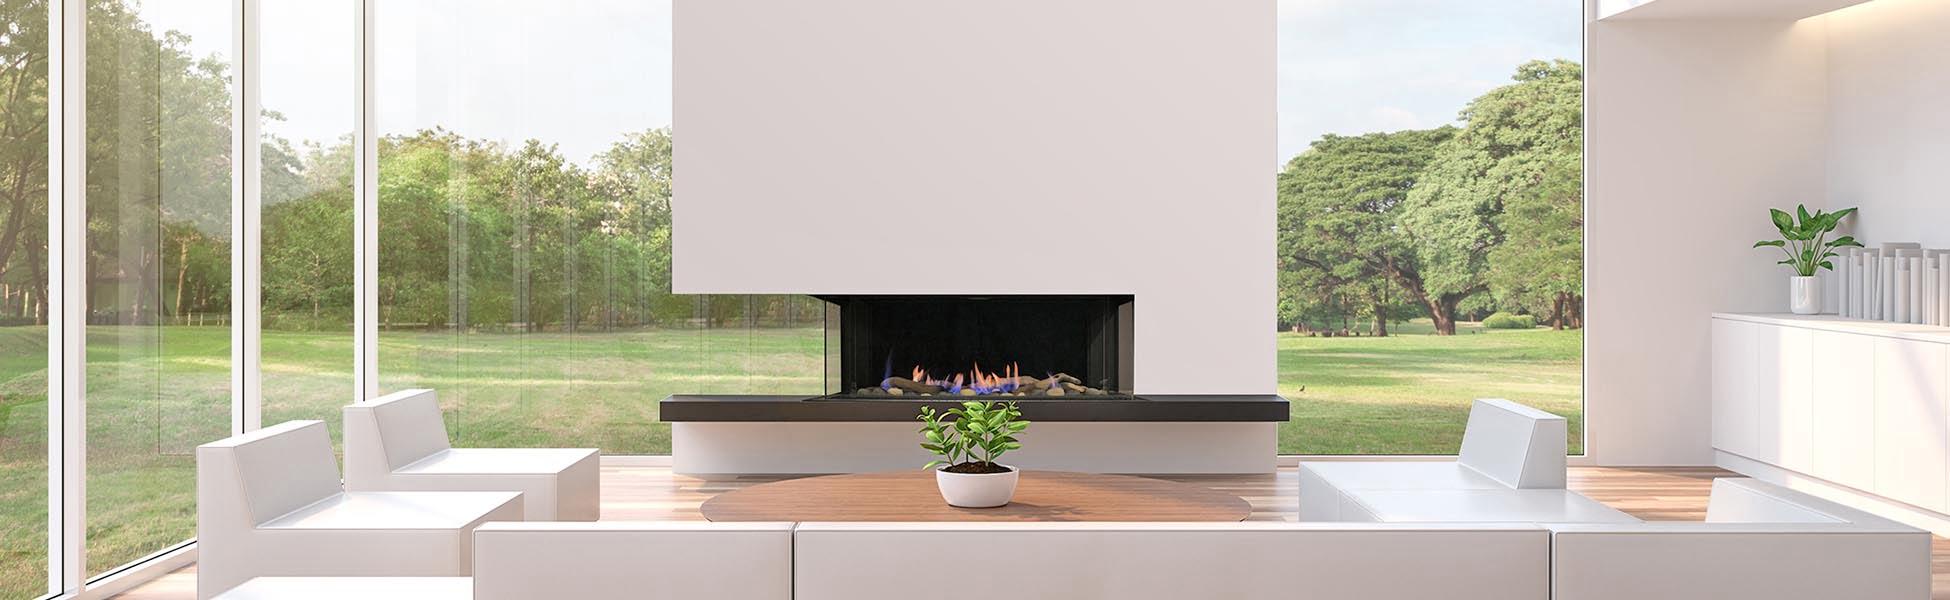 Toscana gas fireplace